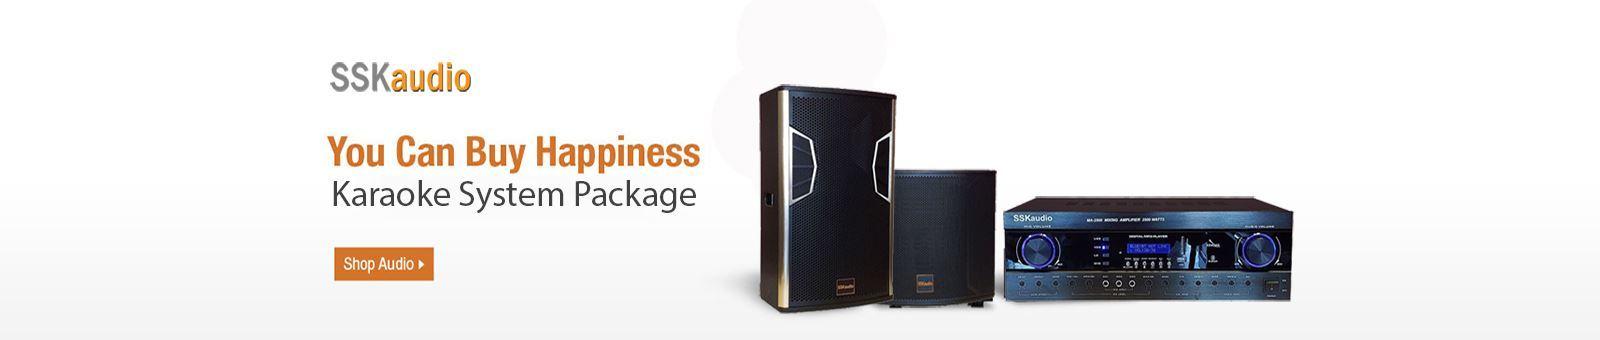 SSKaudio karaoke package system